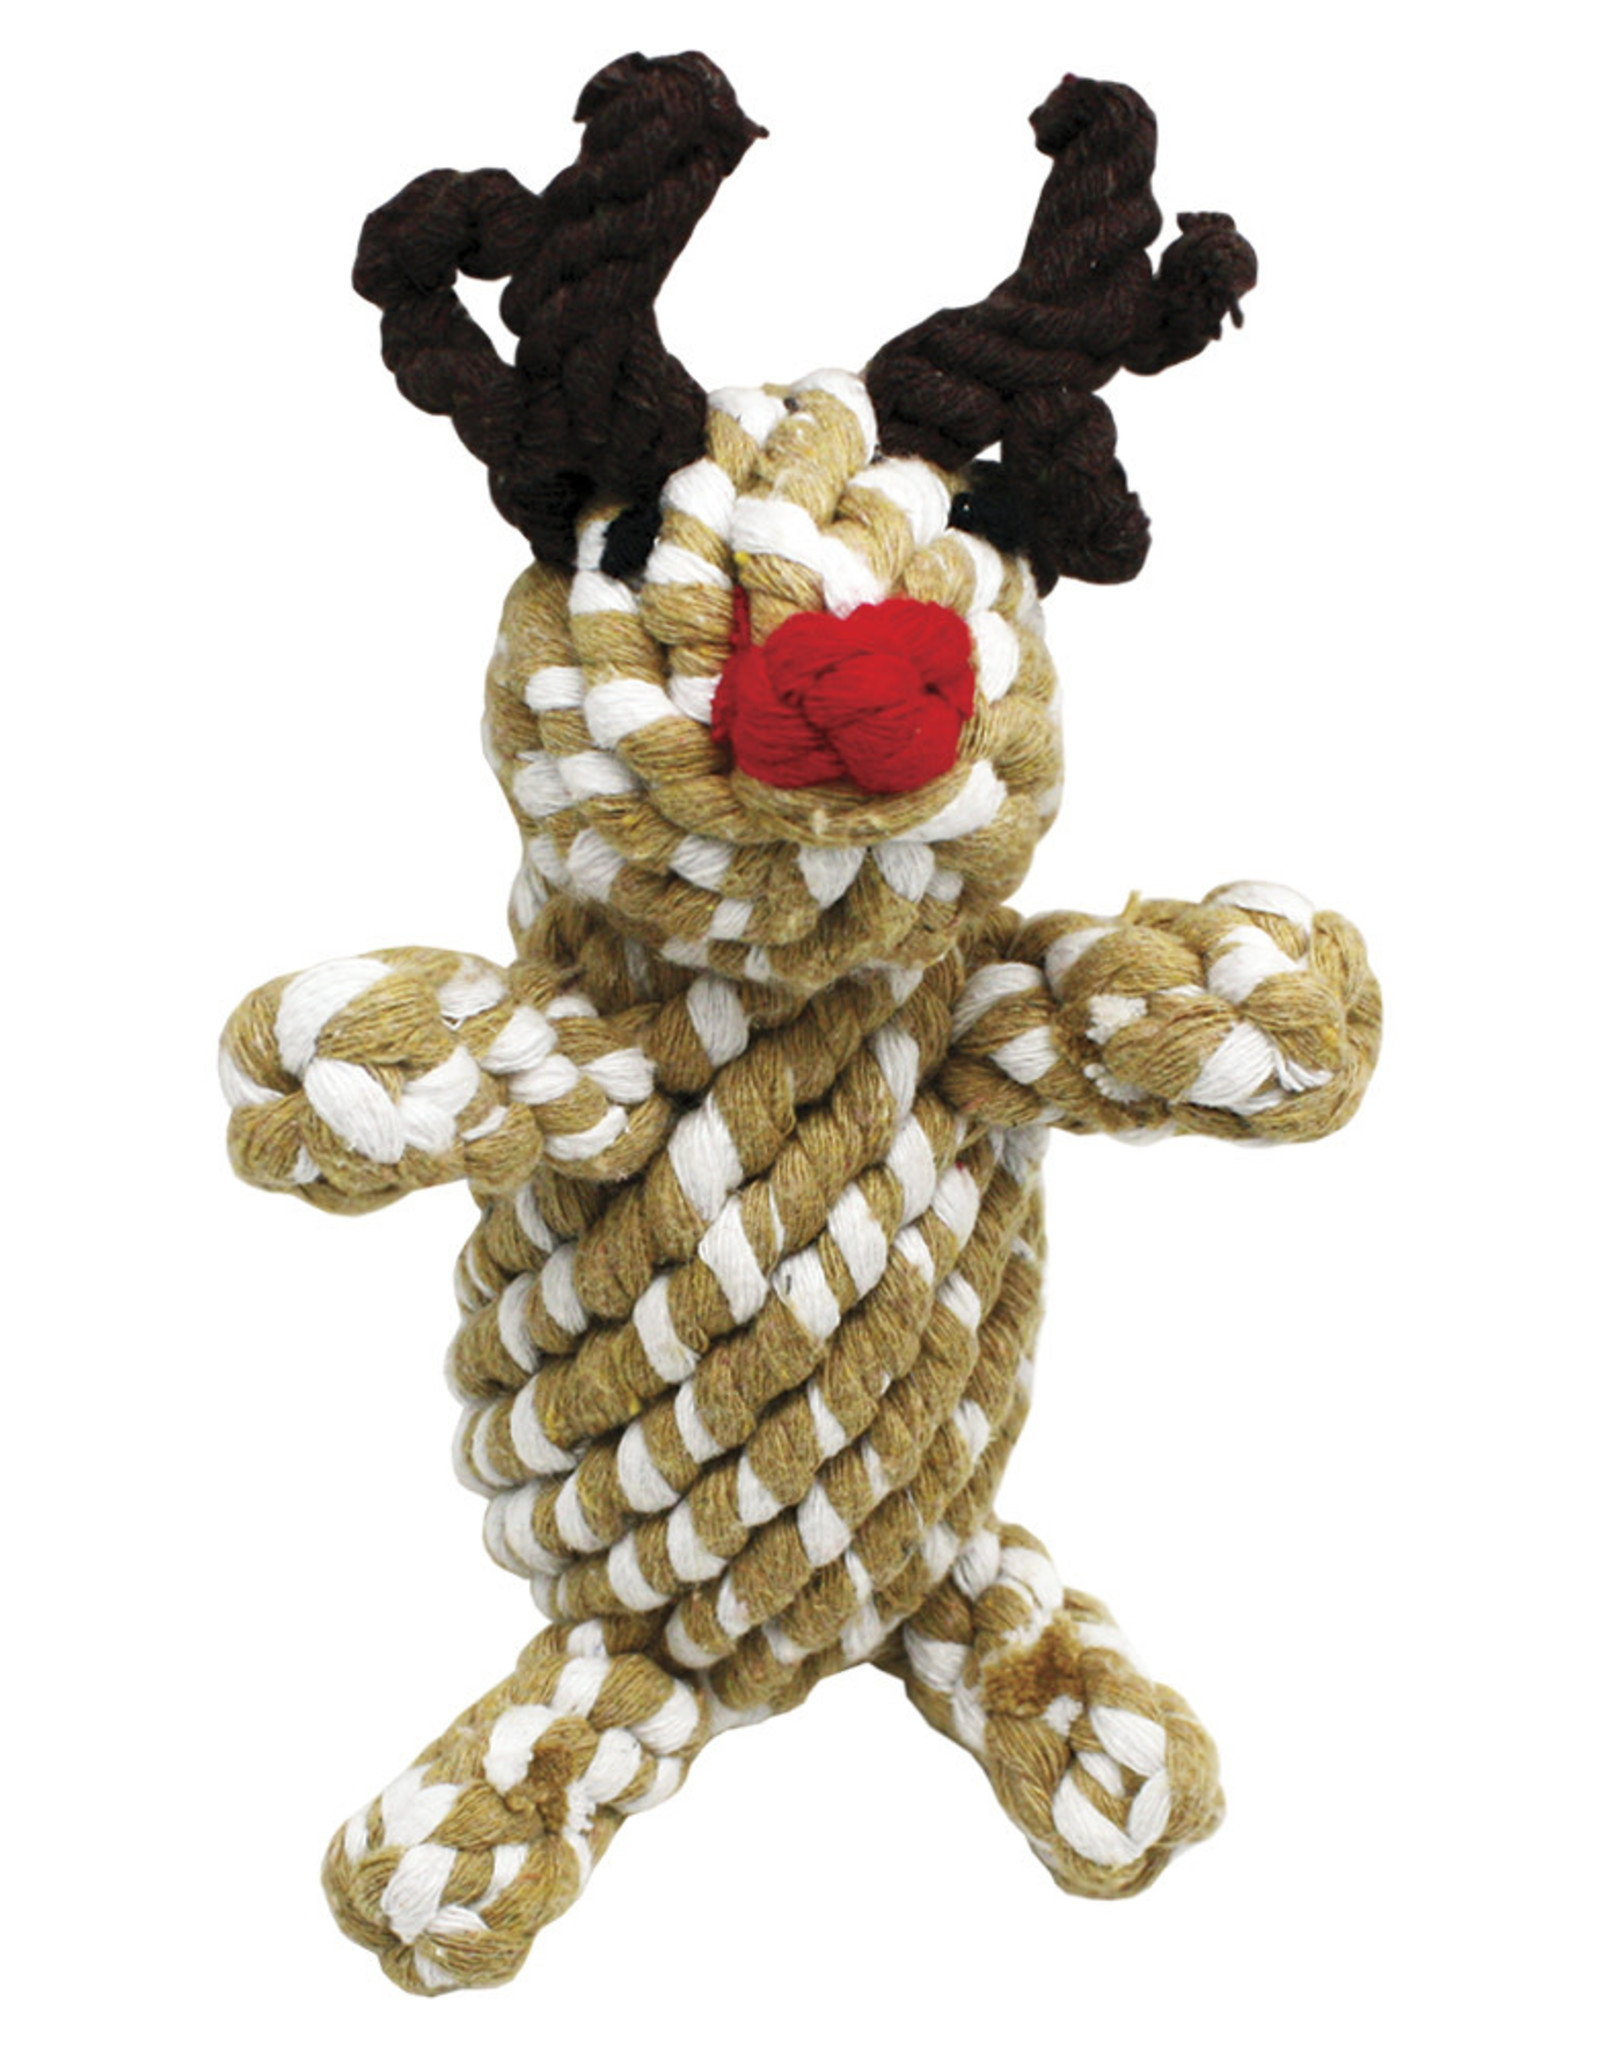 Happy Pet Christmas Rope Reindeer Dog Toy, 16cm 6.4inch